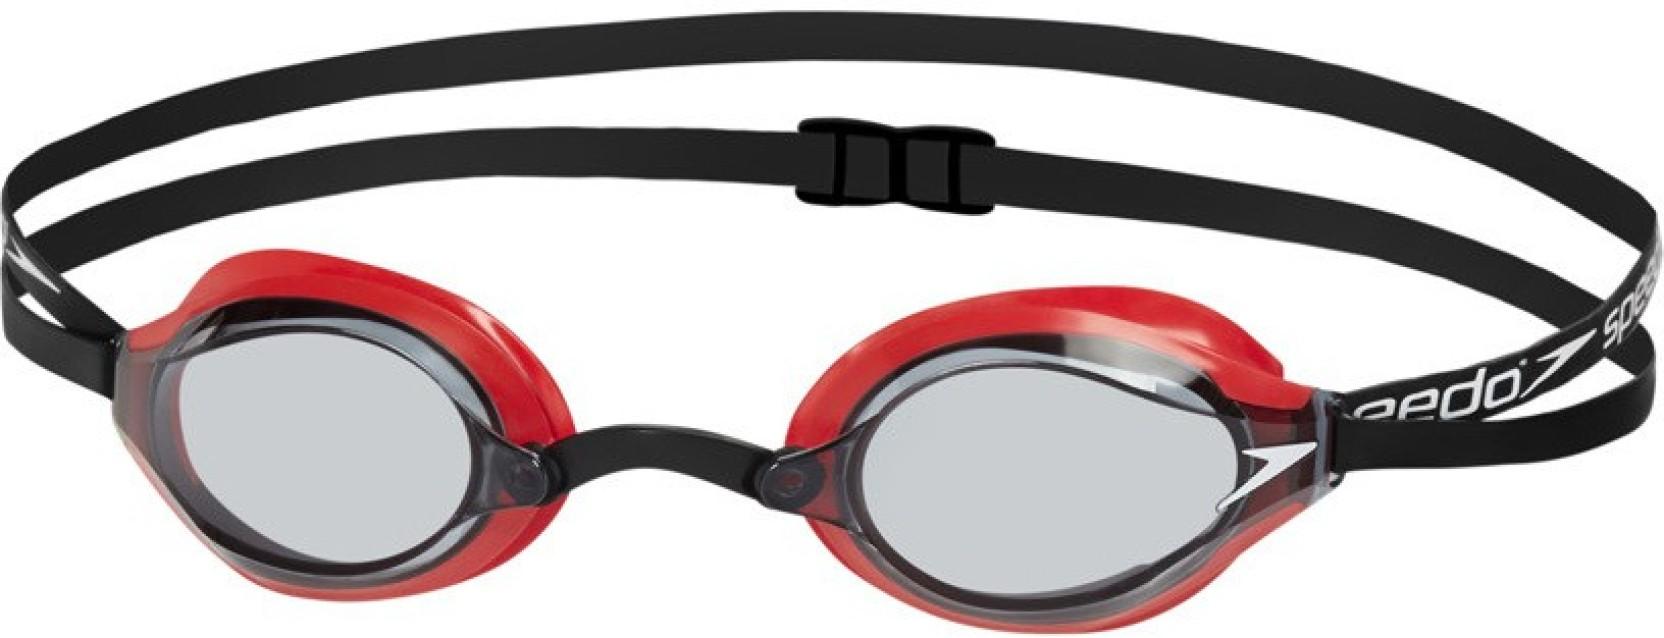 a16af72b476 Speedo Fastskin Speedsocket 2 Swimming Goggles - Buy Speedo Fastskin ...